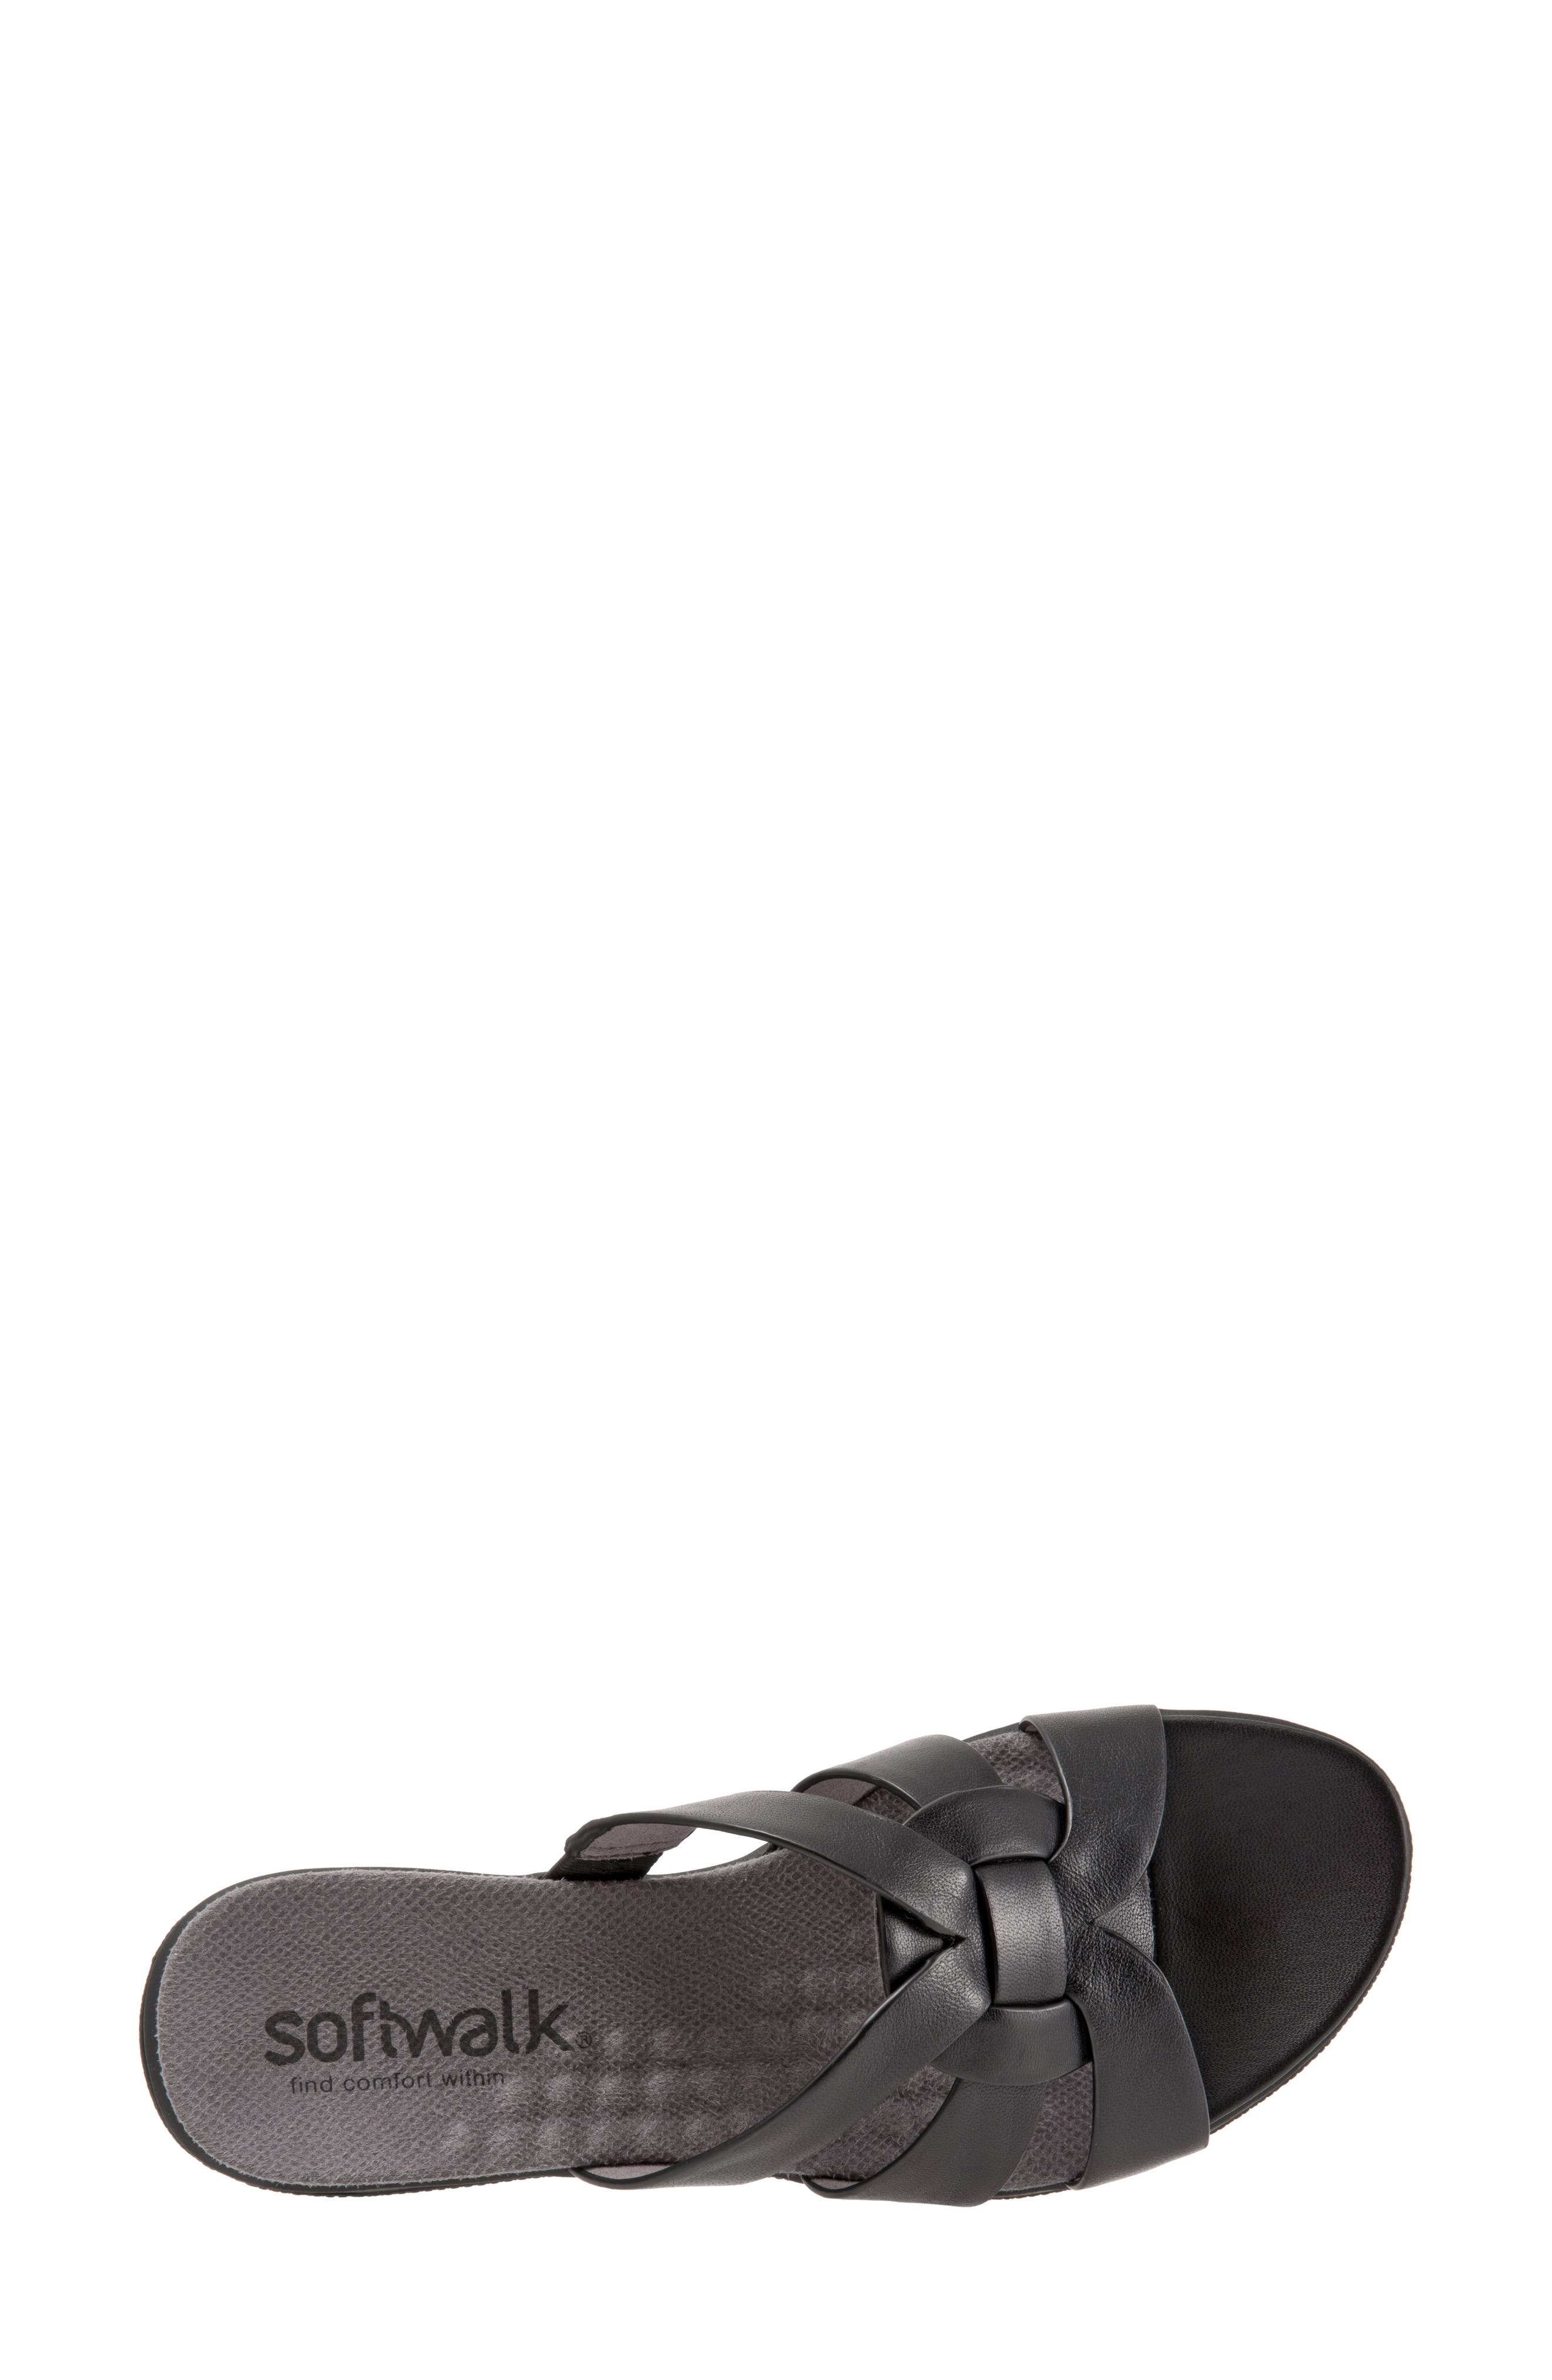 Thompson Slide Sandal,                             Alternate thumbnail 5, color,                             Black Leather